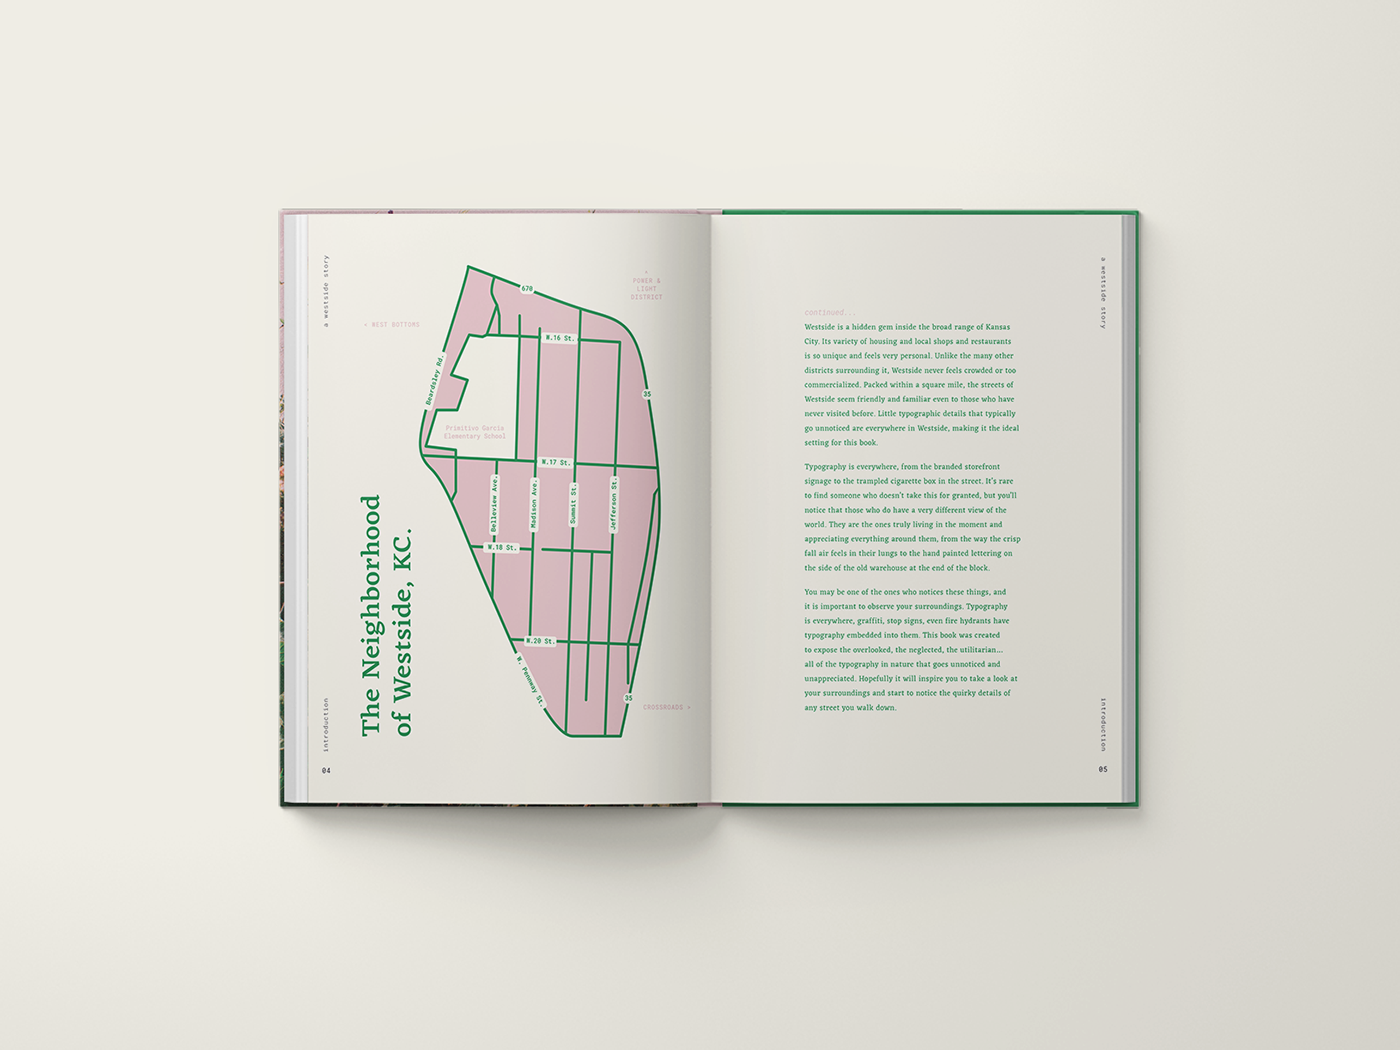 kansas city,Layout,photos,typography  ,Nature,editorial,vintage,grain,ecclectic,KCMO